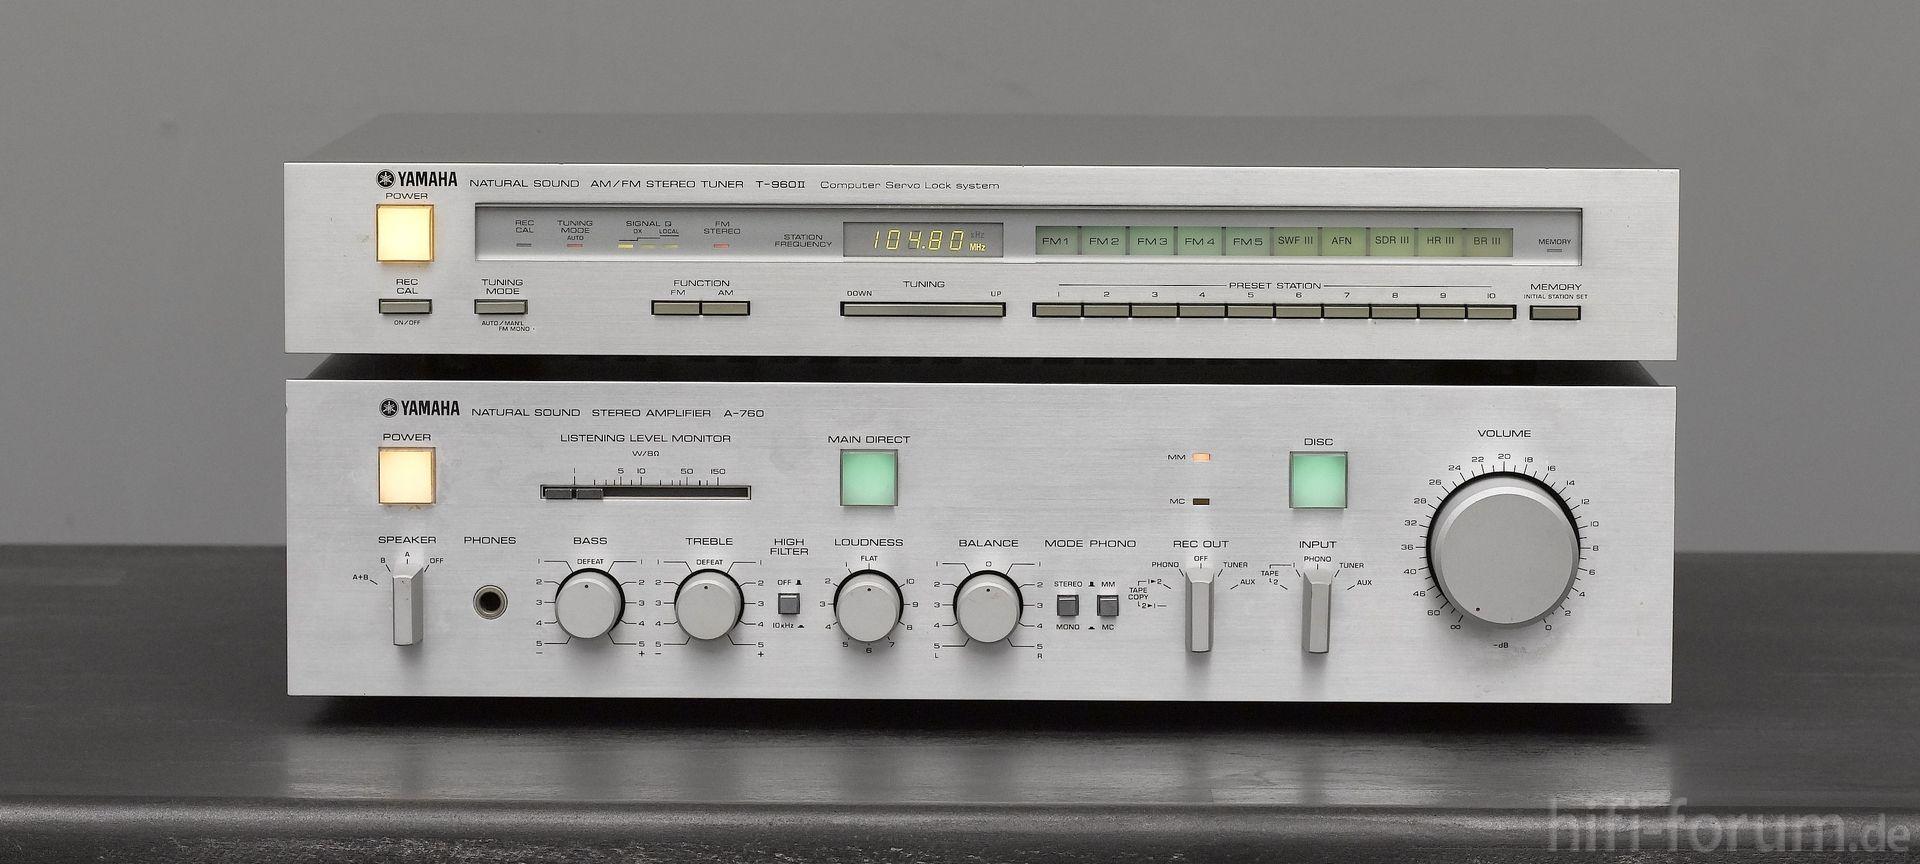 Yamaha A760 und Yamaha T960II   hifiklassiker, stereo, yamaha   hifi